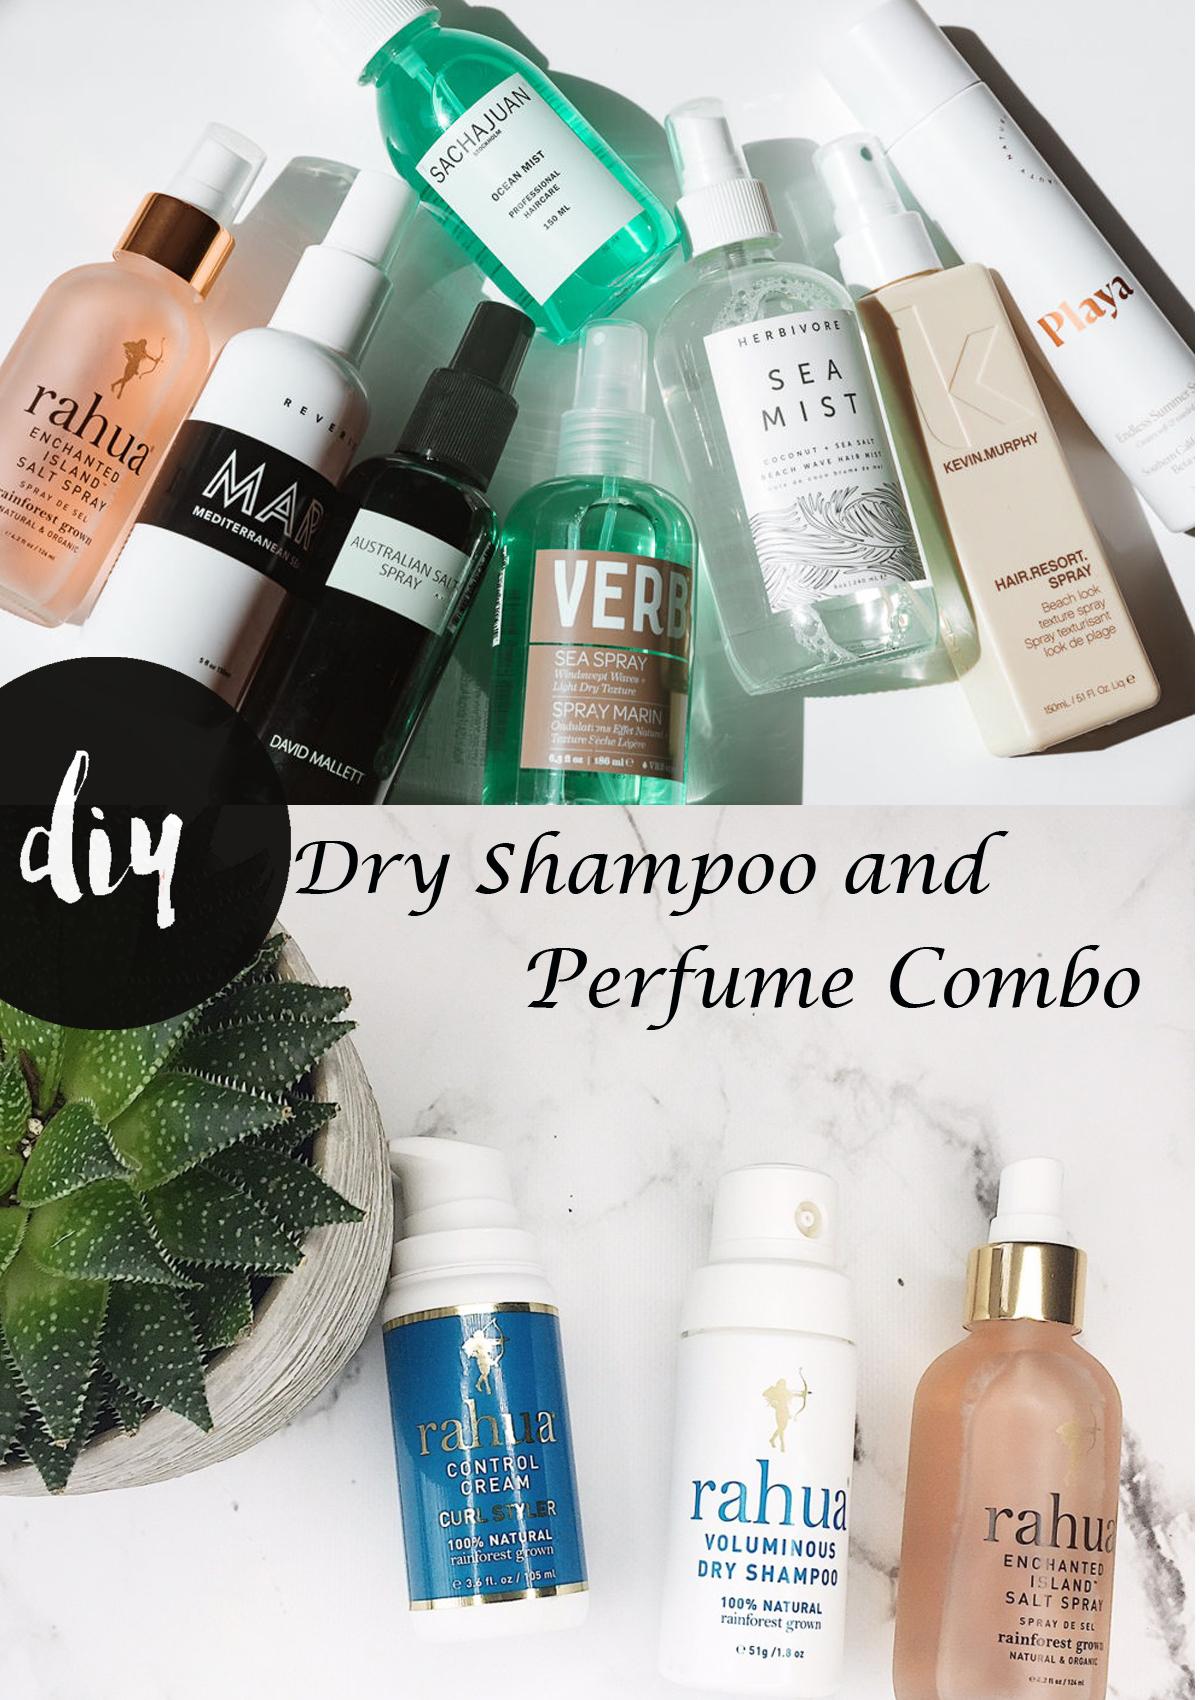 dry-shampoo-and-perfume-combo